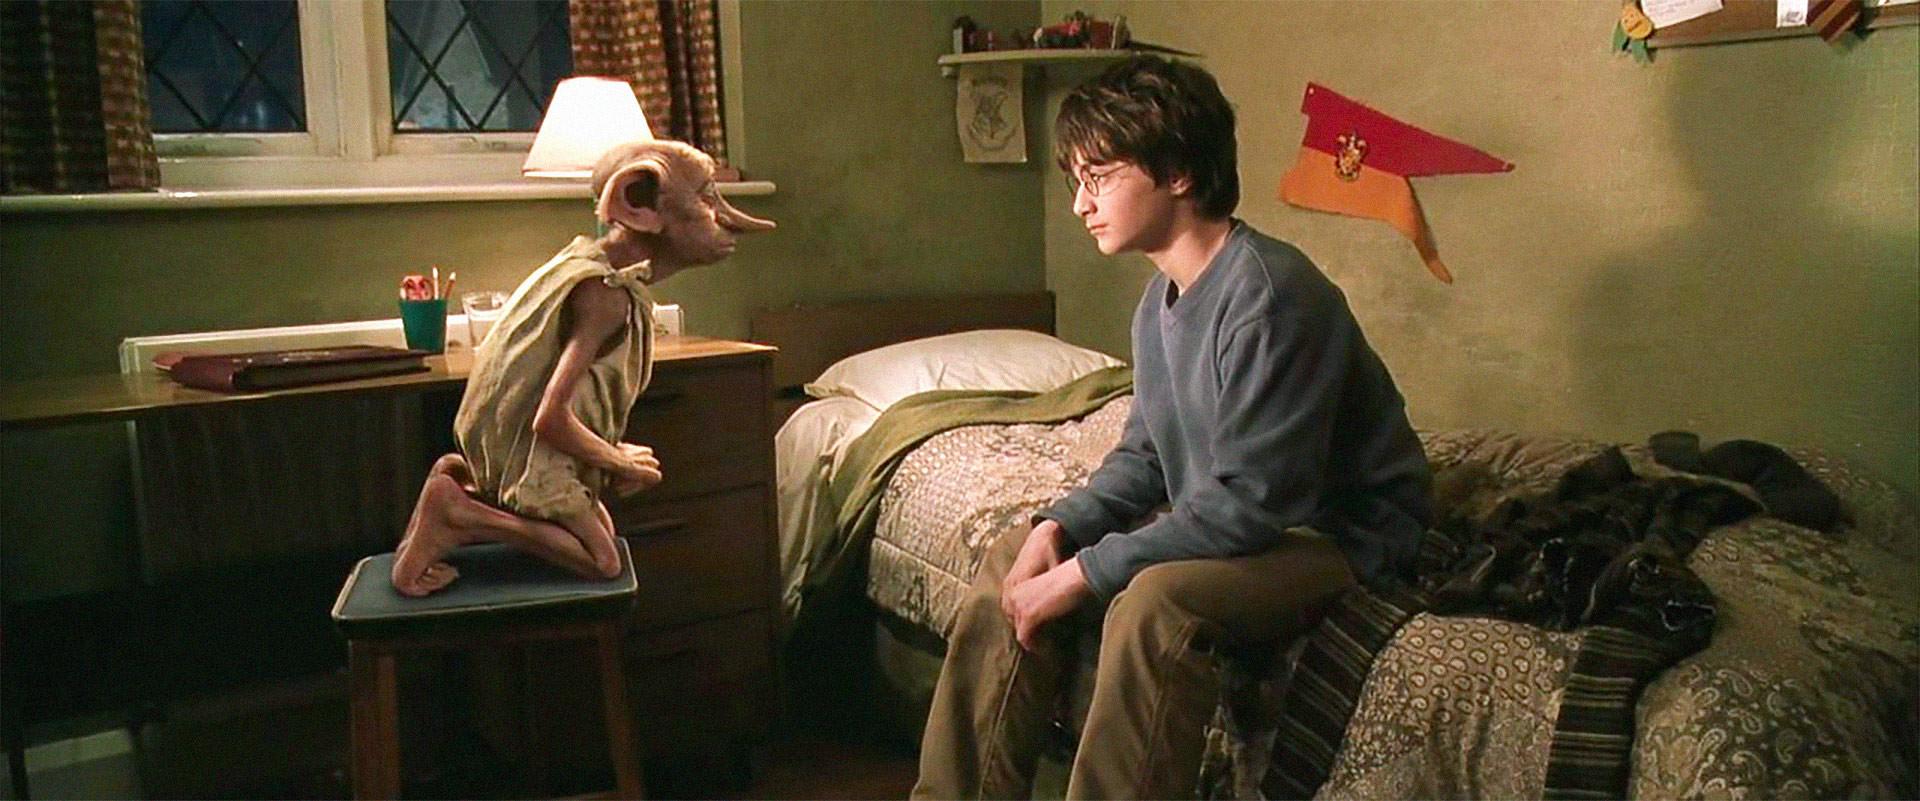 "<p>Кадр из фильма ""Гарри Поттер и Тайная комната""/ Скриншот &copy; L!FE</p>"